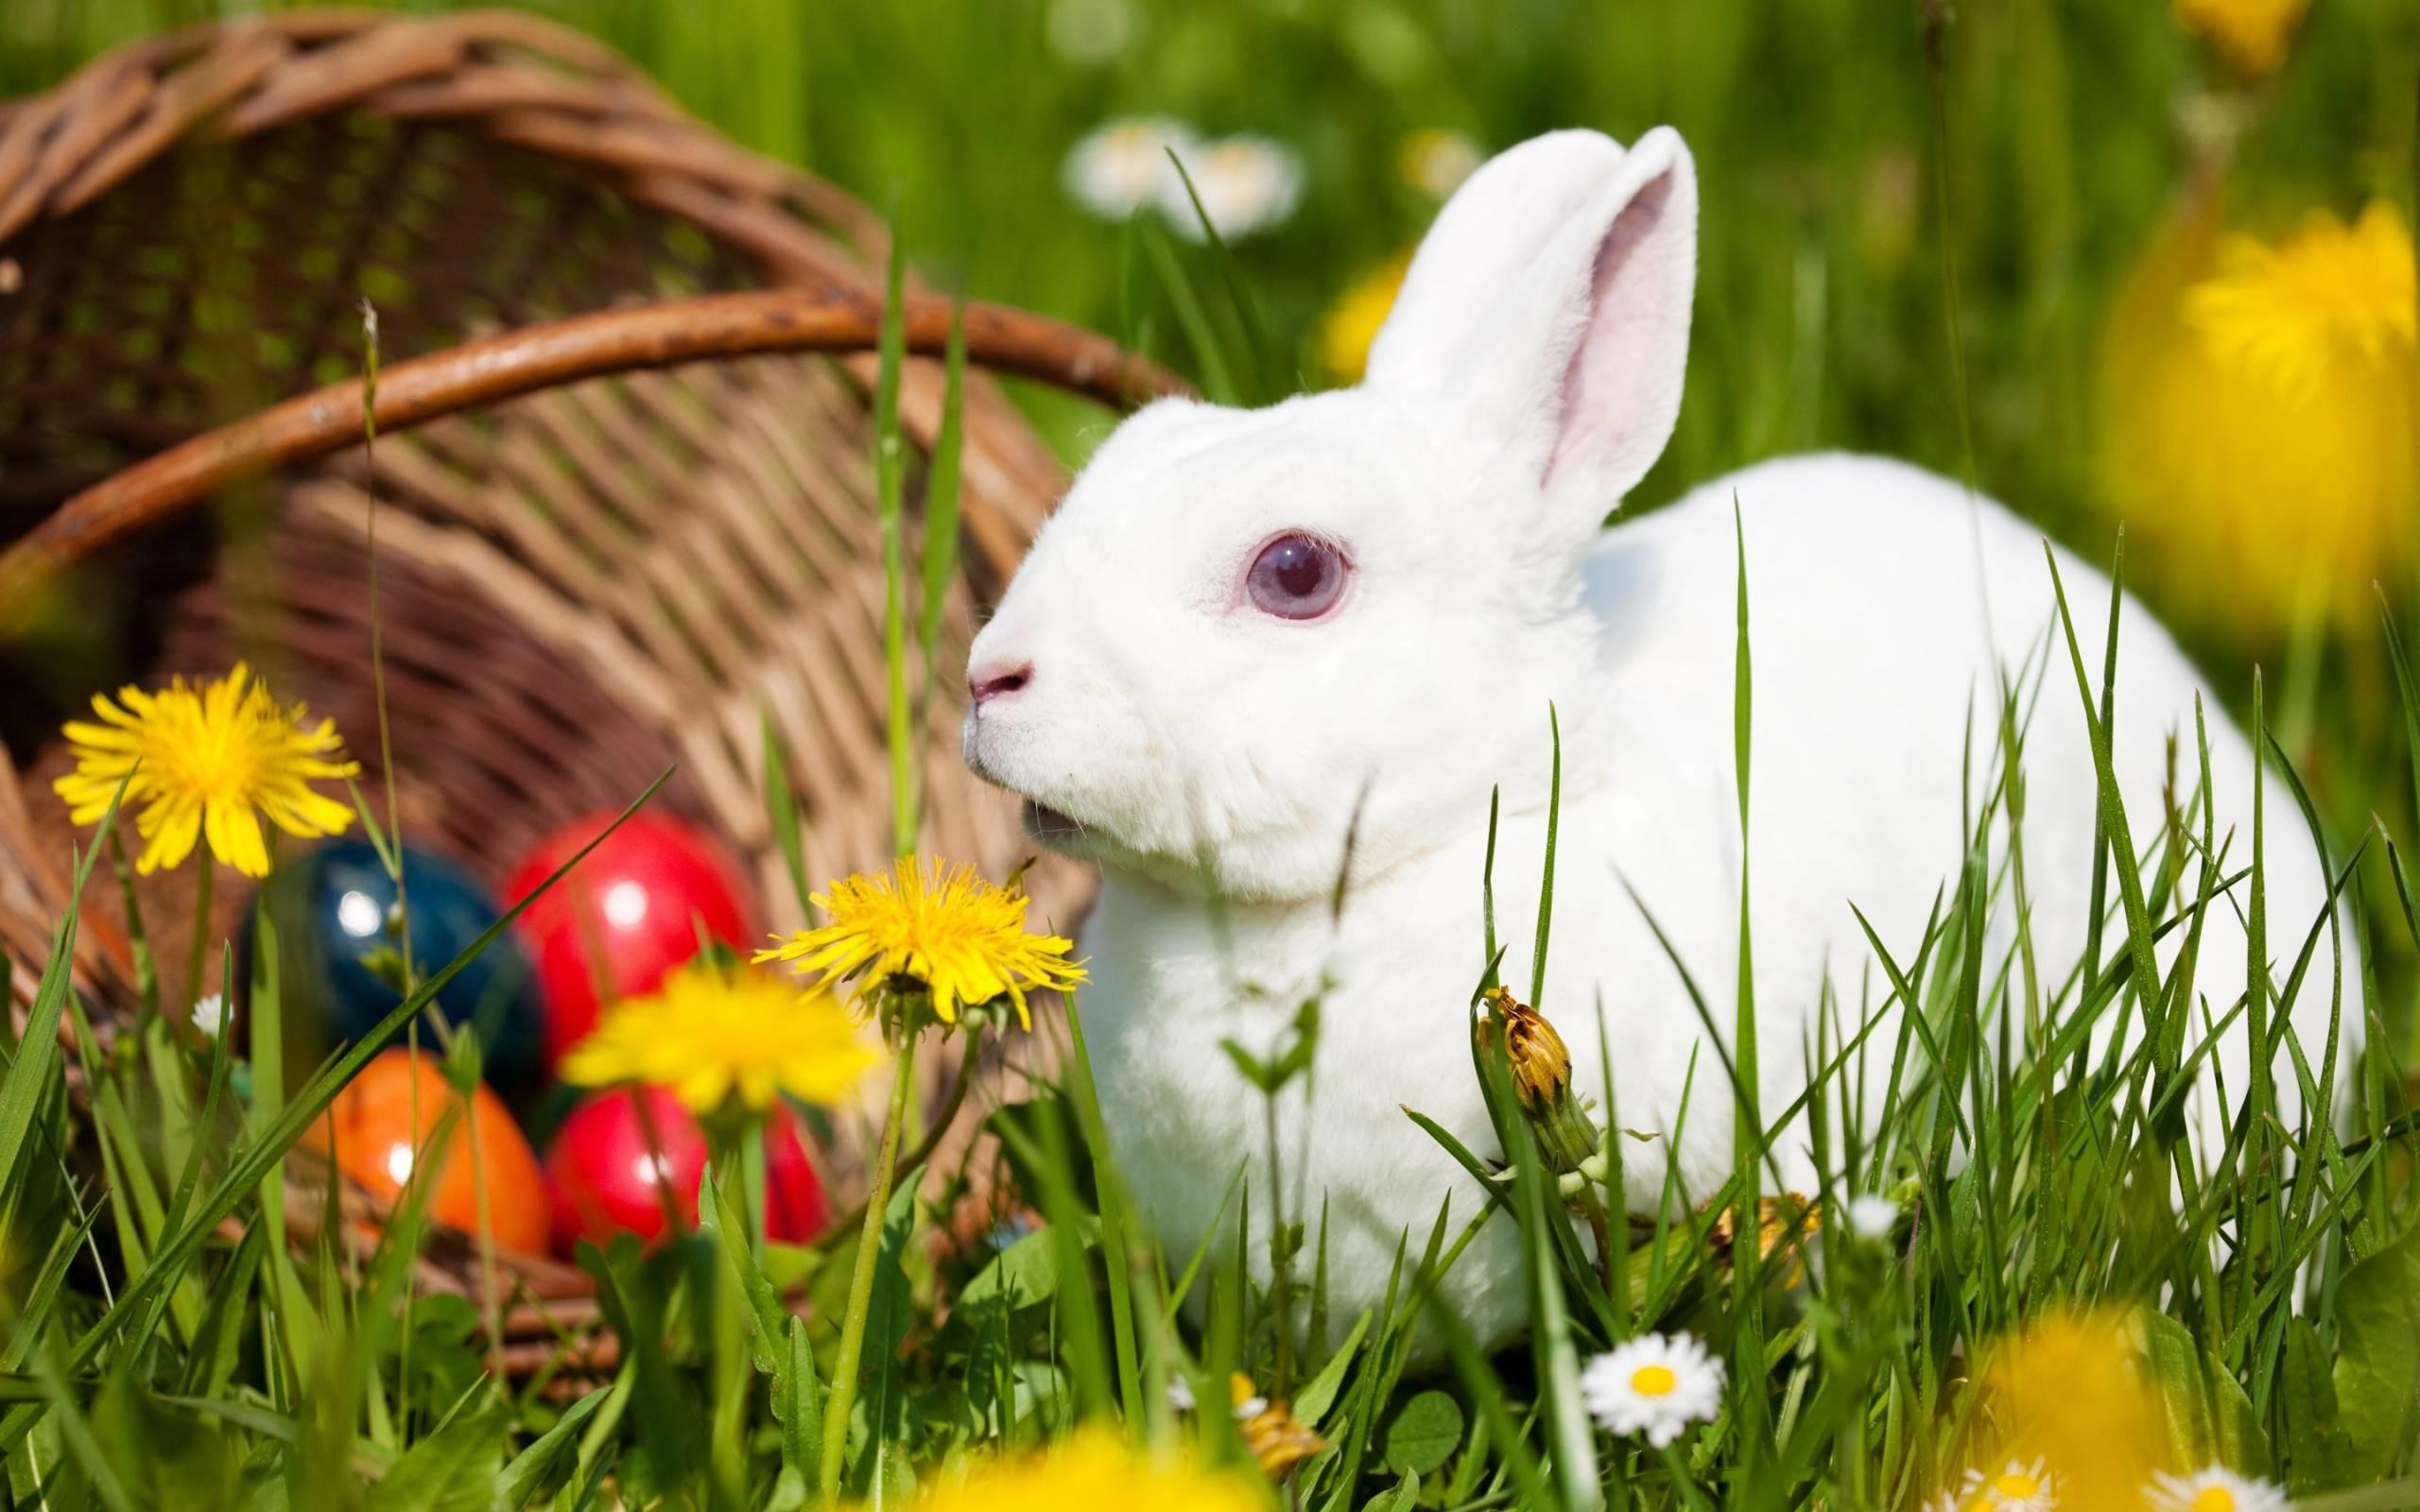 Rabbit Wallpapers For Desktop 65 Images